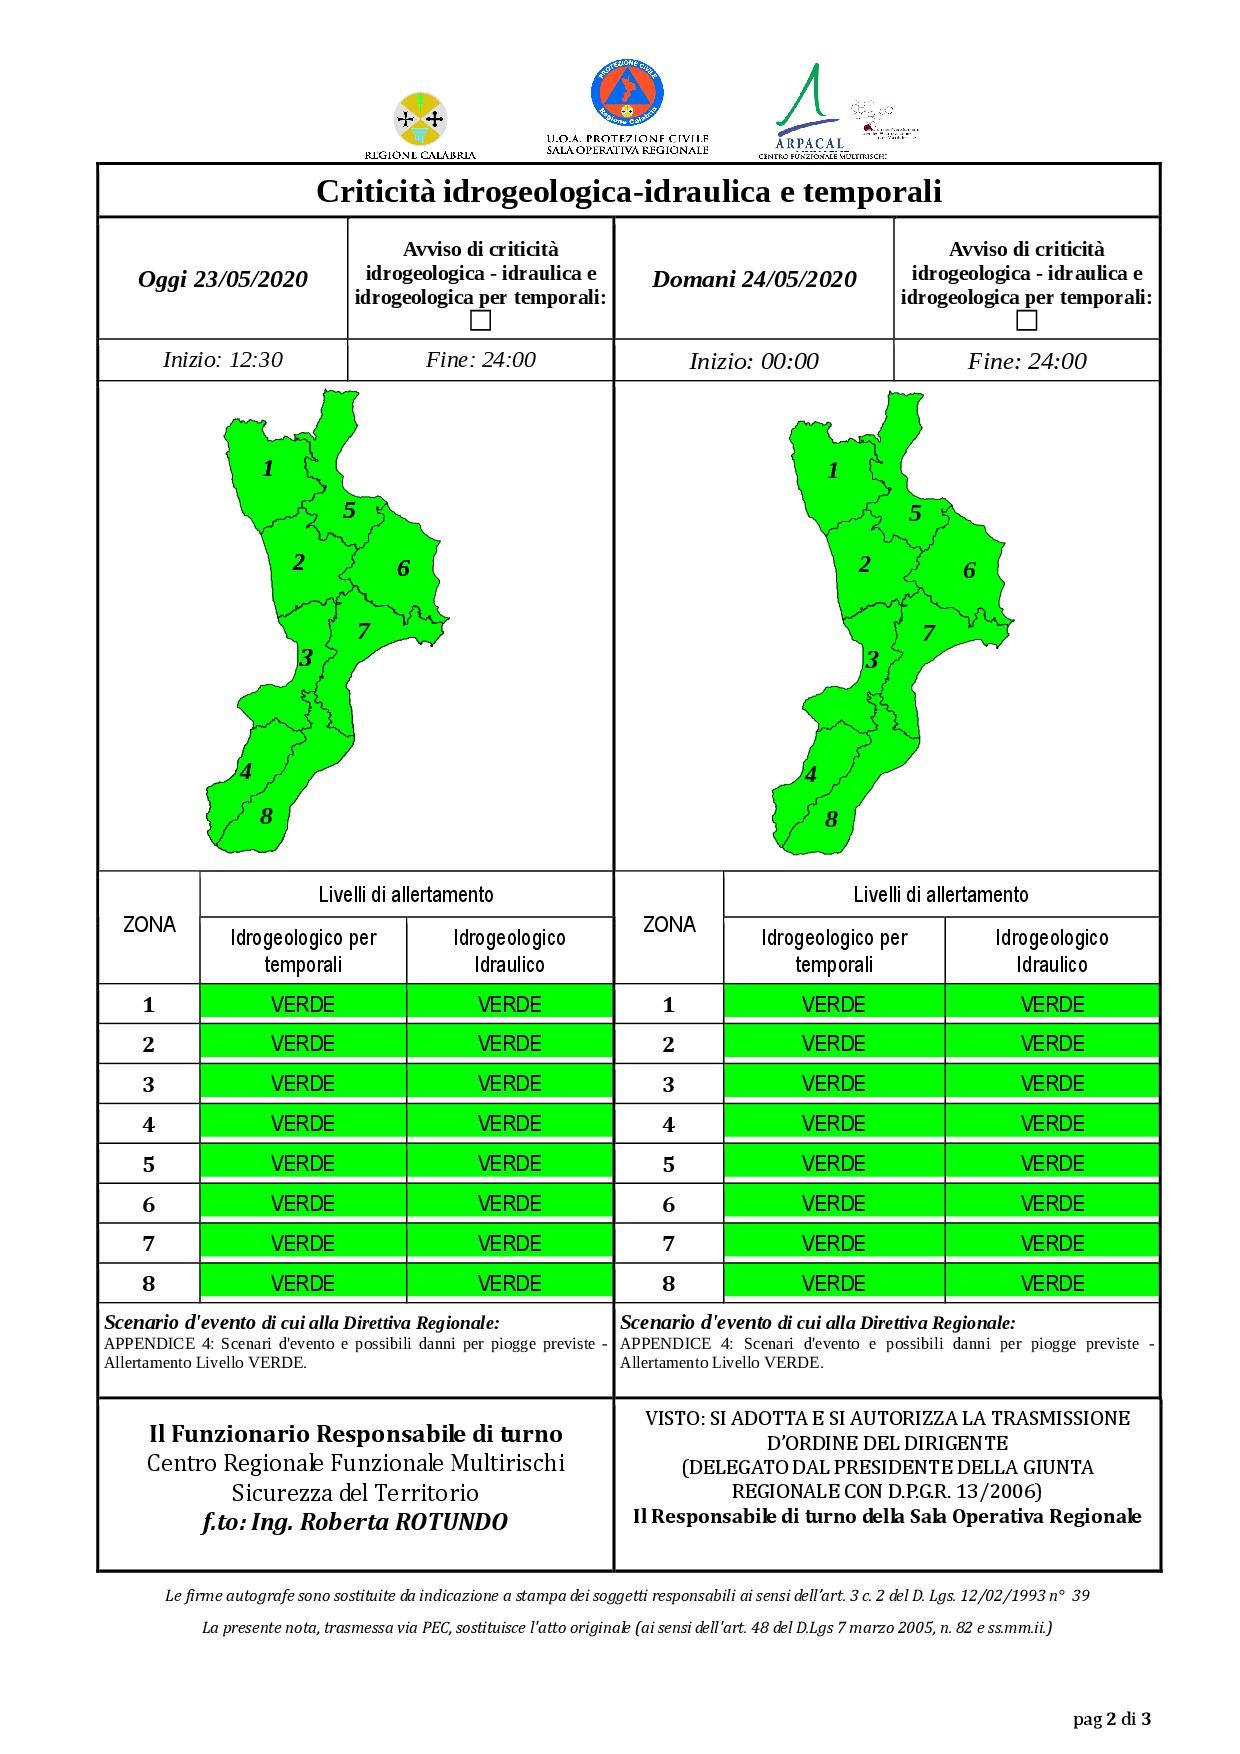 Criticità idrogeologica-idraulica e temporali in Calabria 23-05-2020